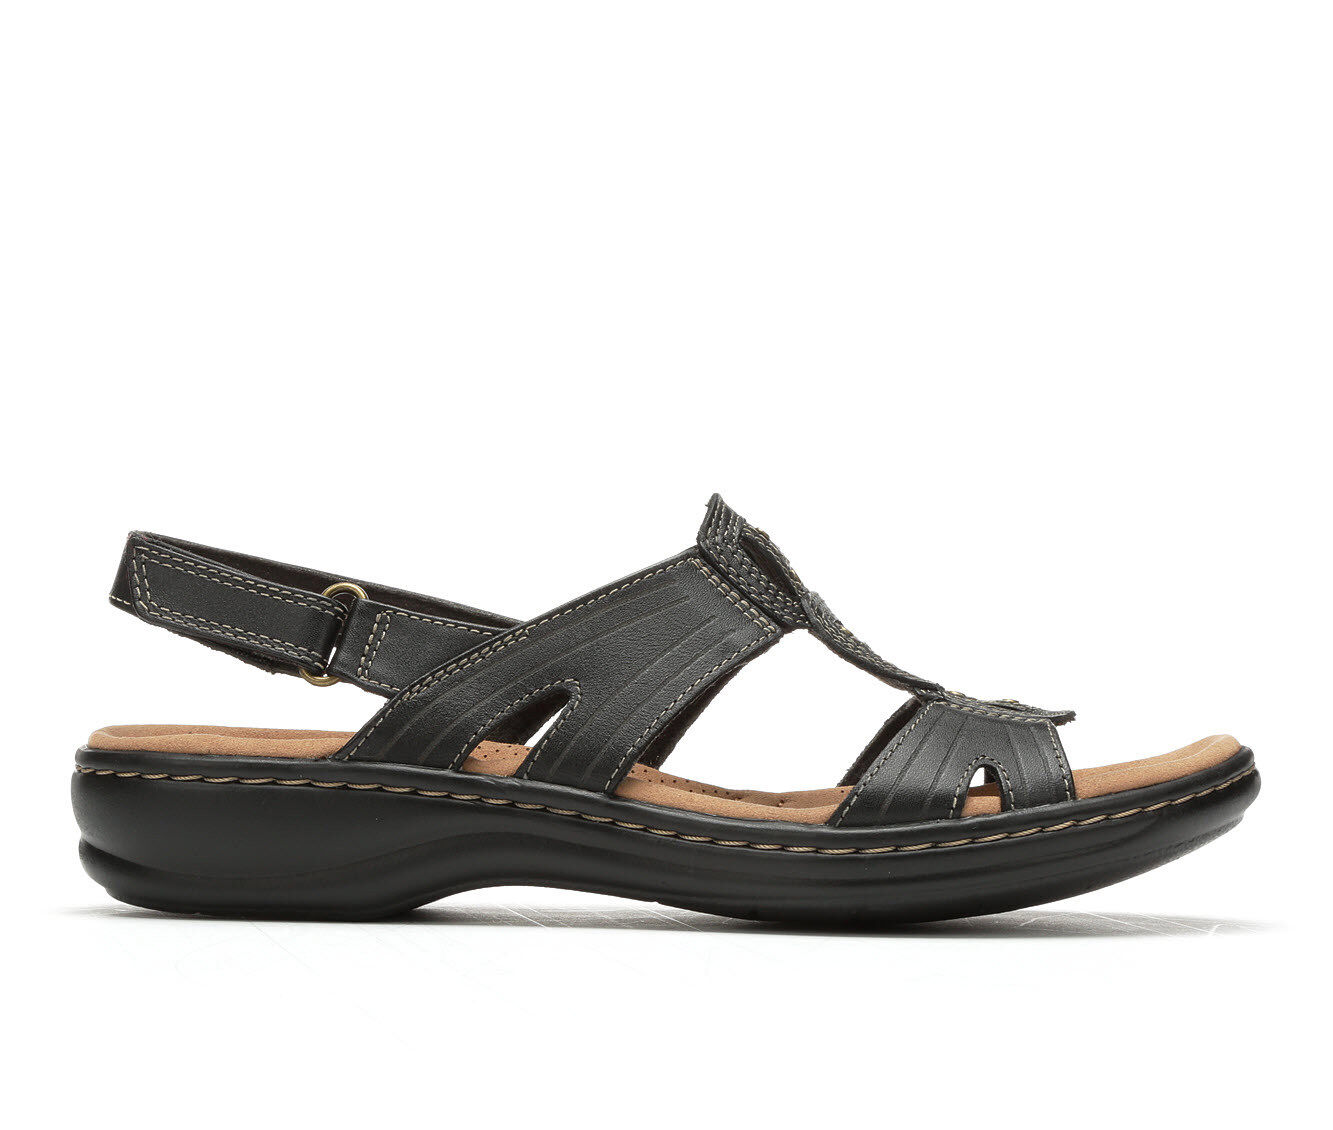 Ladies/Women's Clark Sandals /Slip On Shoes Size 7 Free S/H